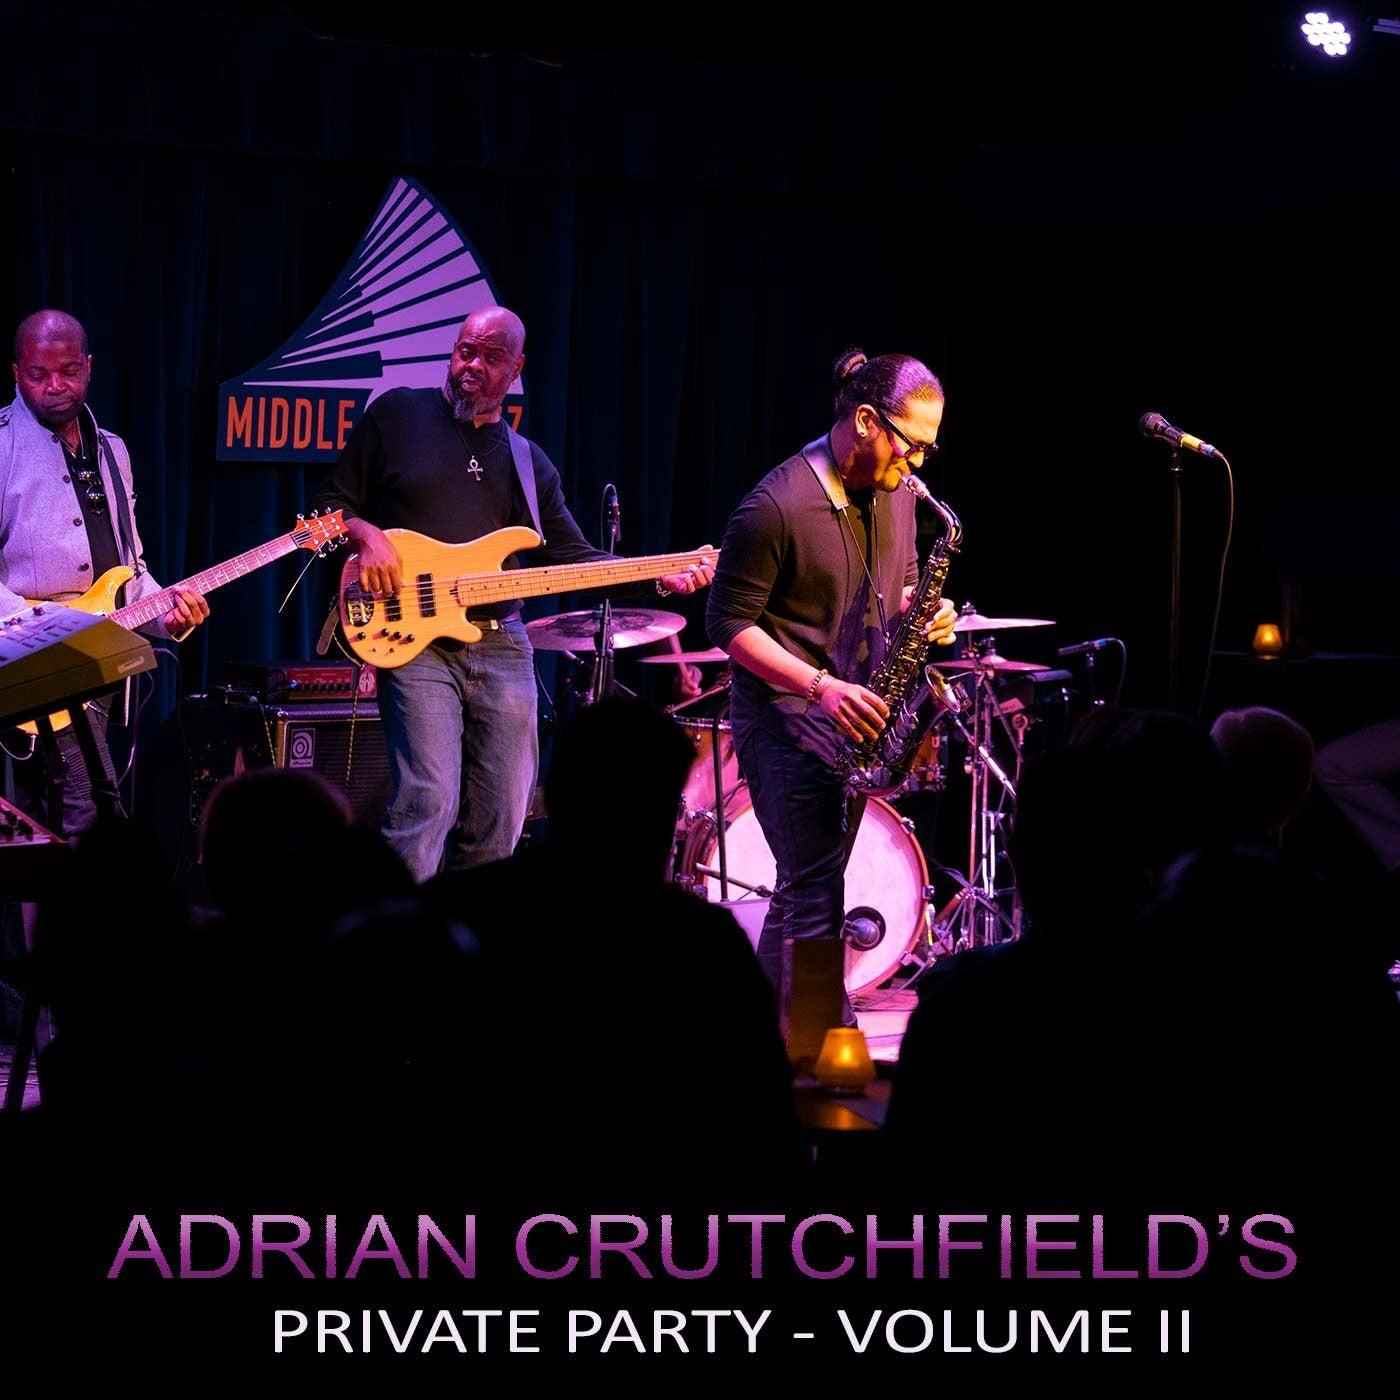 Adrian Crutchfield's Private Party: Volume II